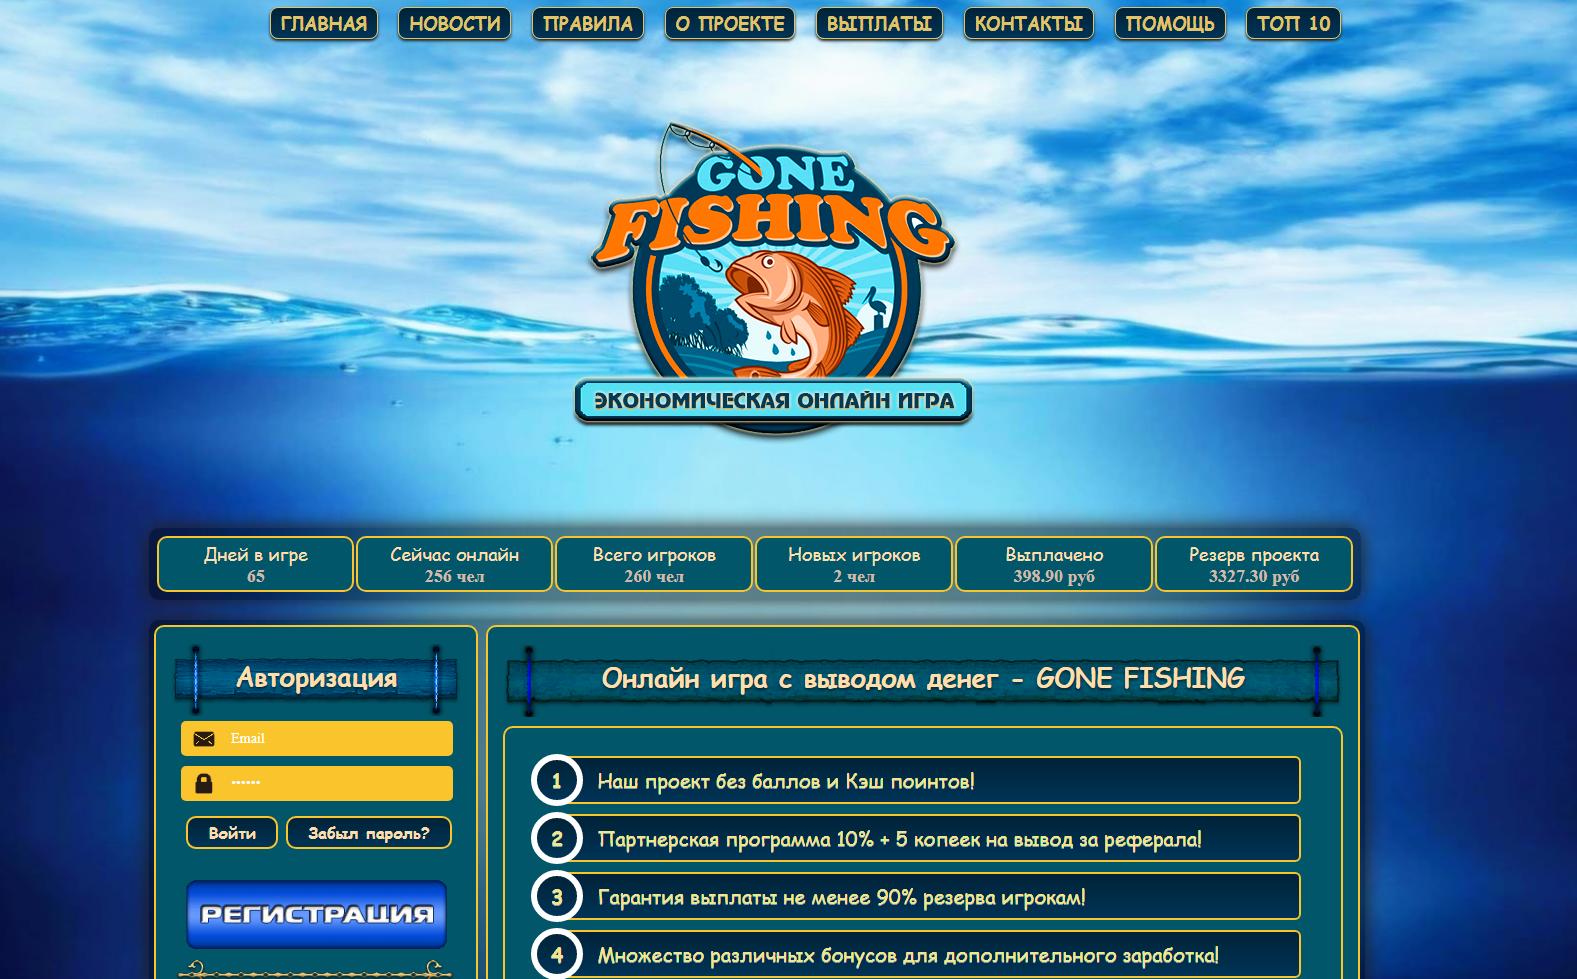 Скрипт игры Gone Fishing